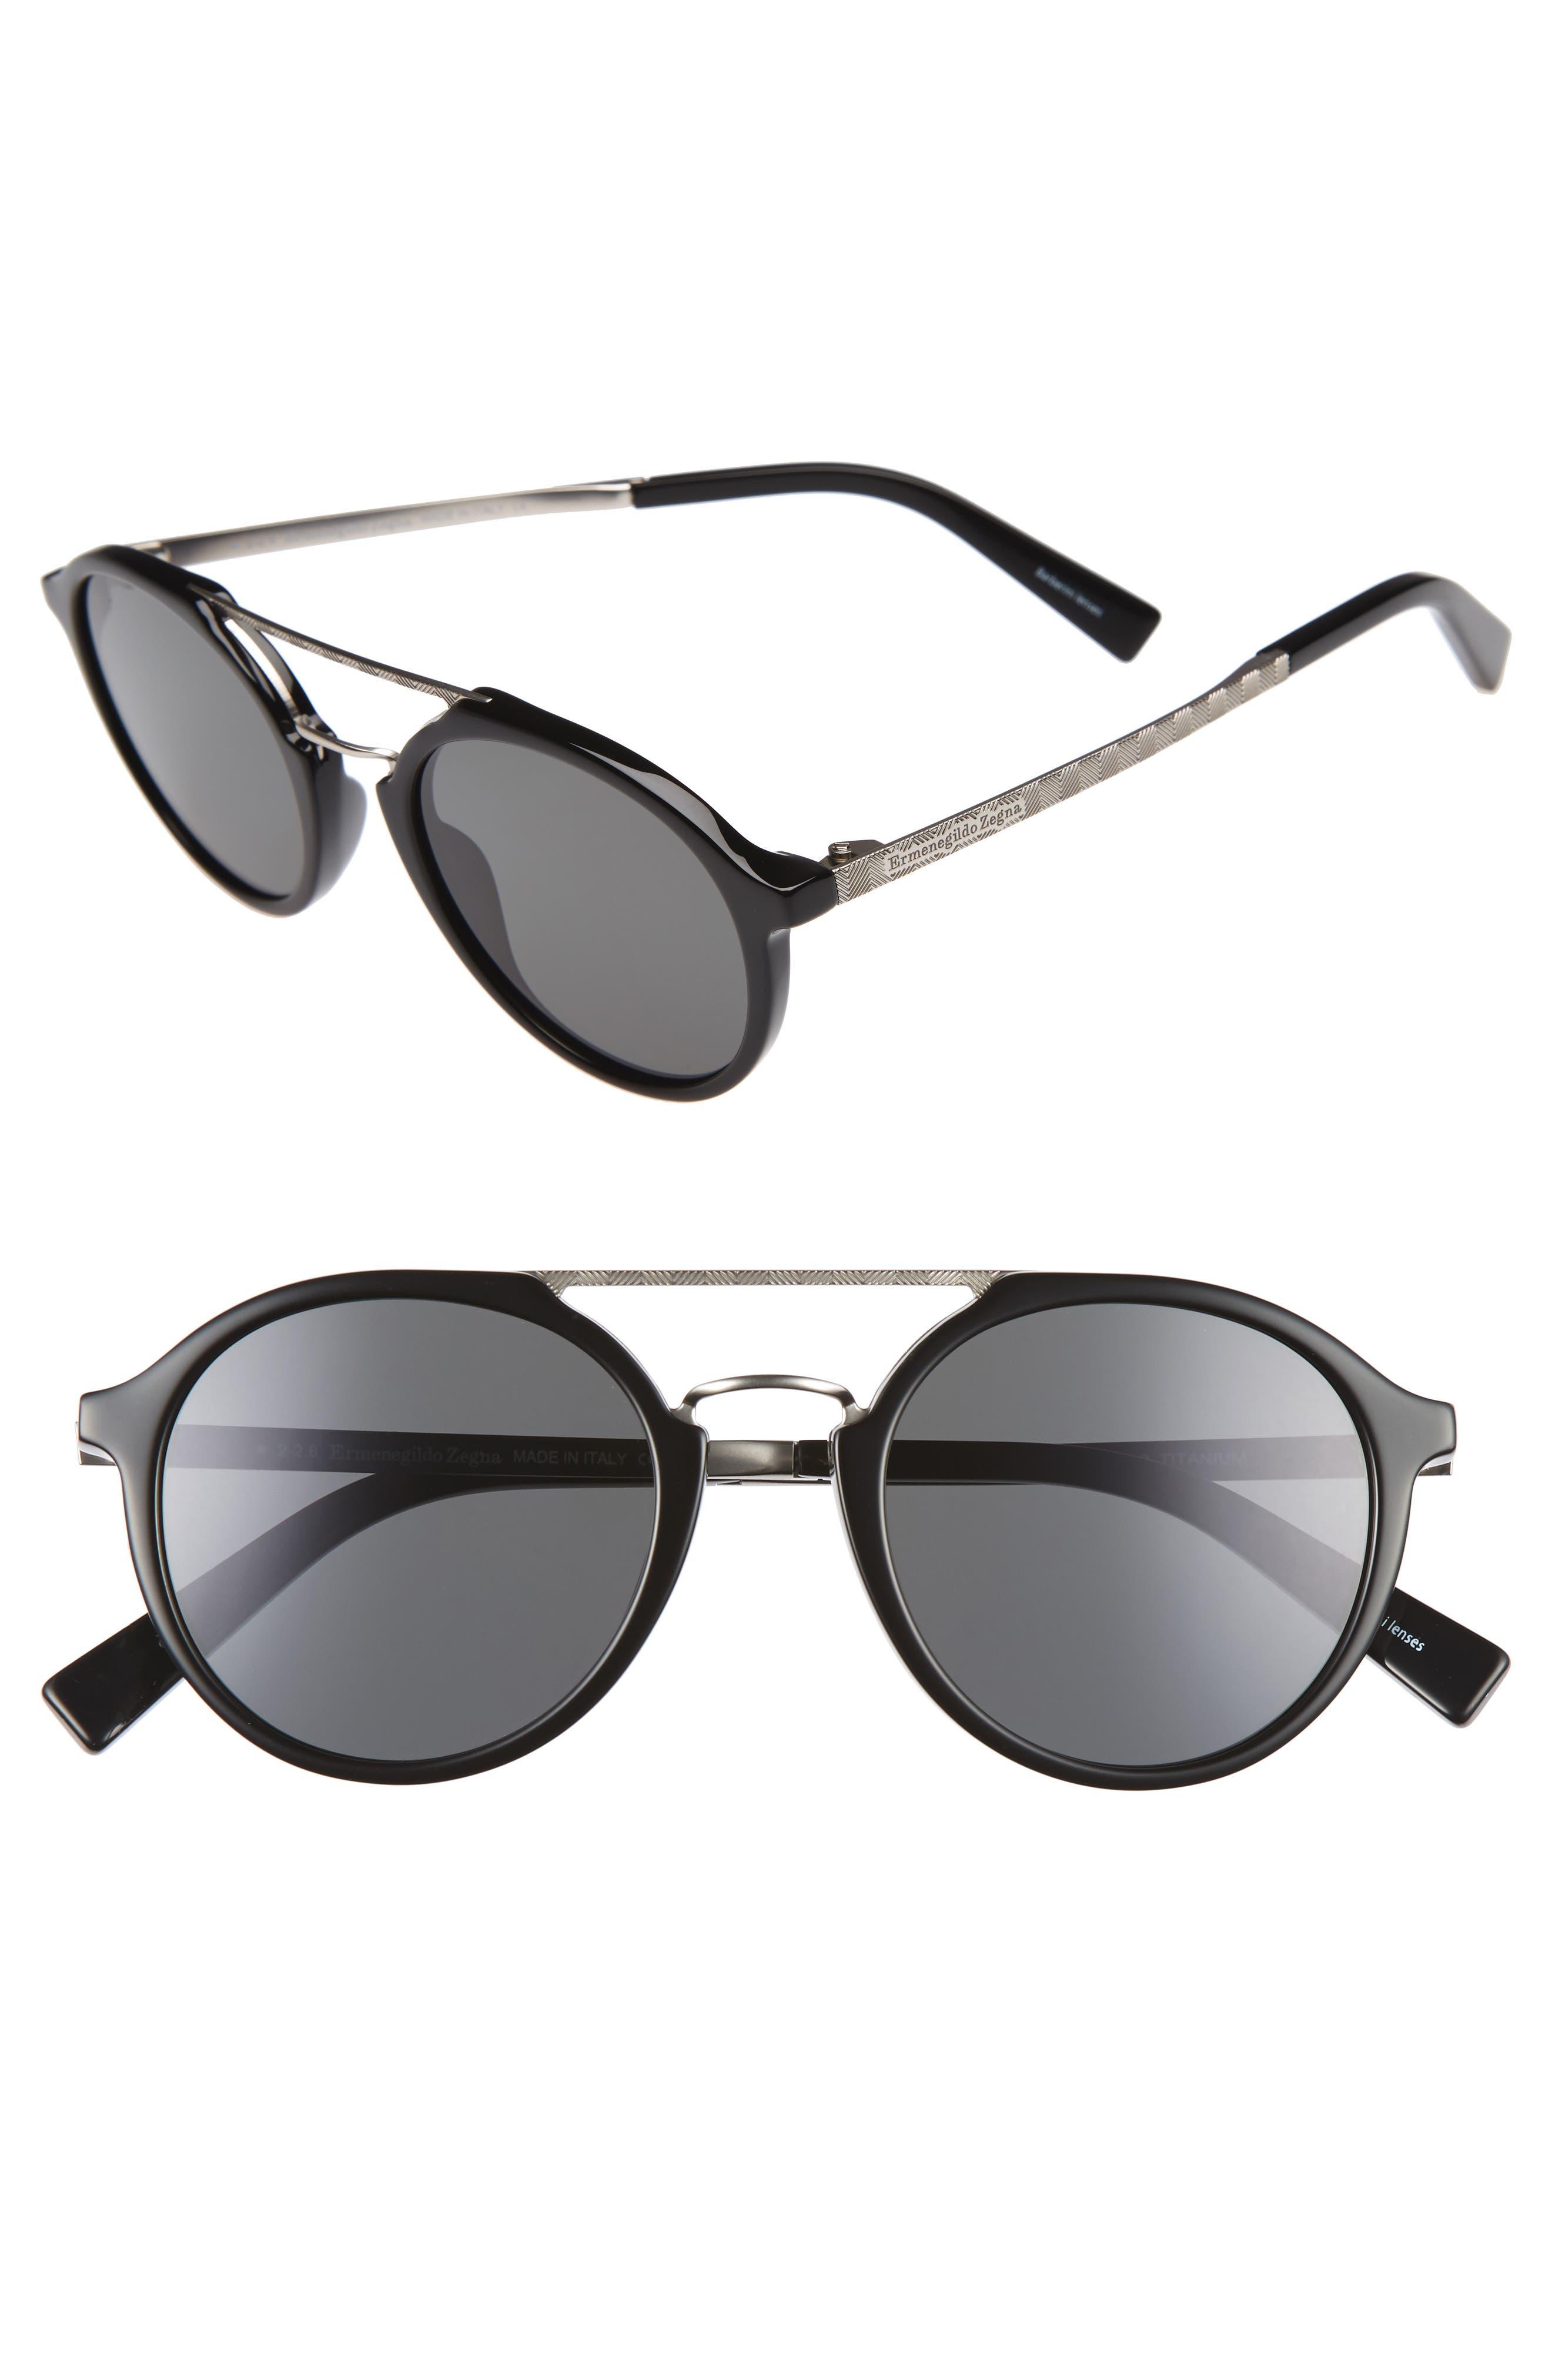 Retro 50mm Sunglasses,                             Alternate thumbnail 2, color,                             018